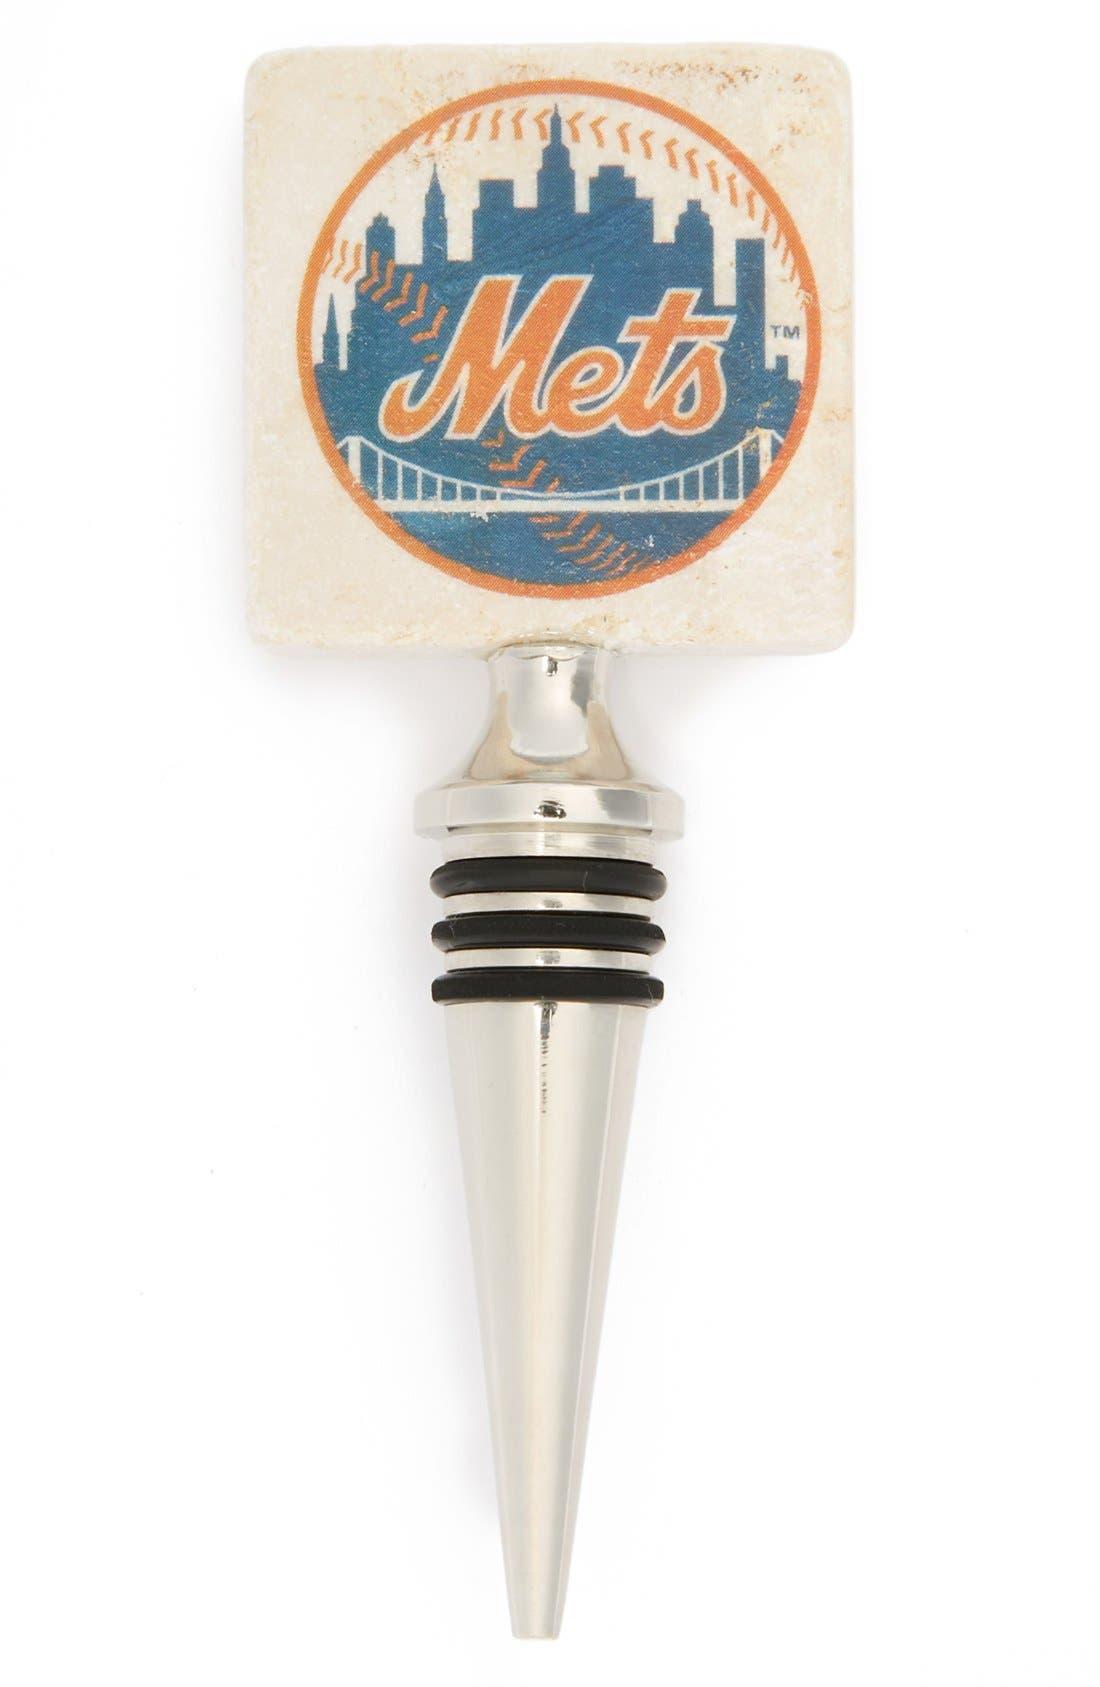 Alternate Image 1 Selected - Studio Vertu 'New York Mets' Wine Stopper